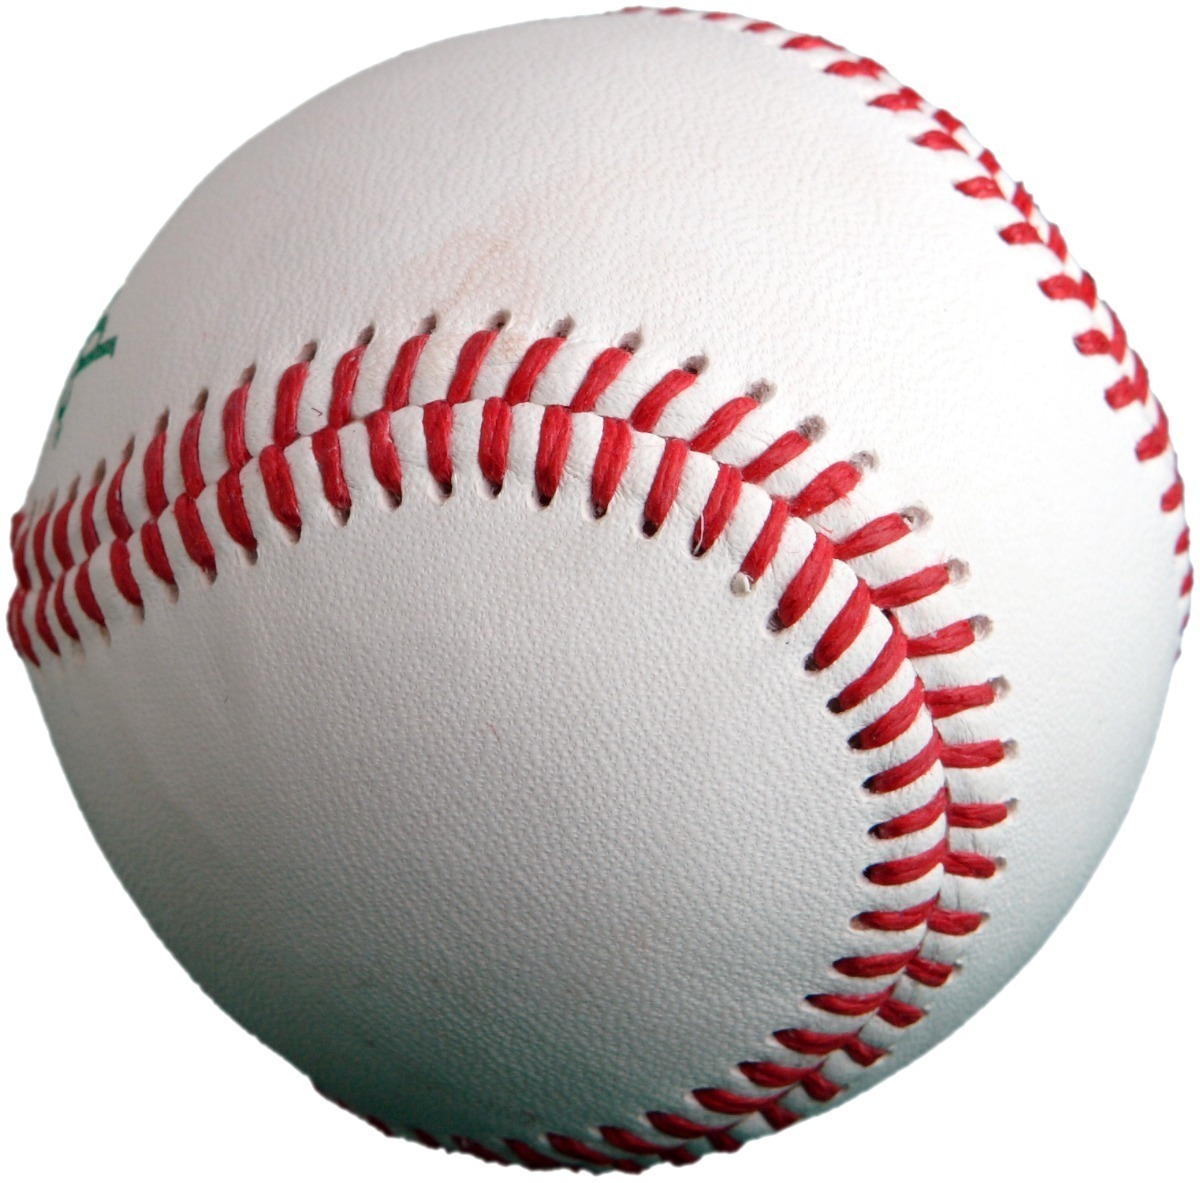 d70ee336fed2a bola de baseball couro vollo 9 vb1090bc due-liss store. Carregando zoom.